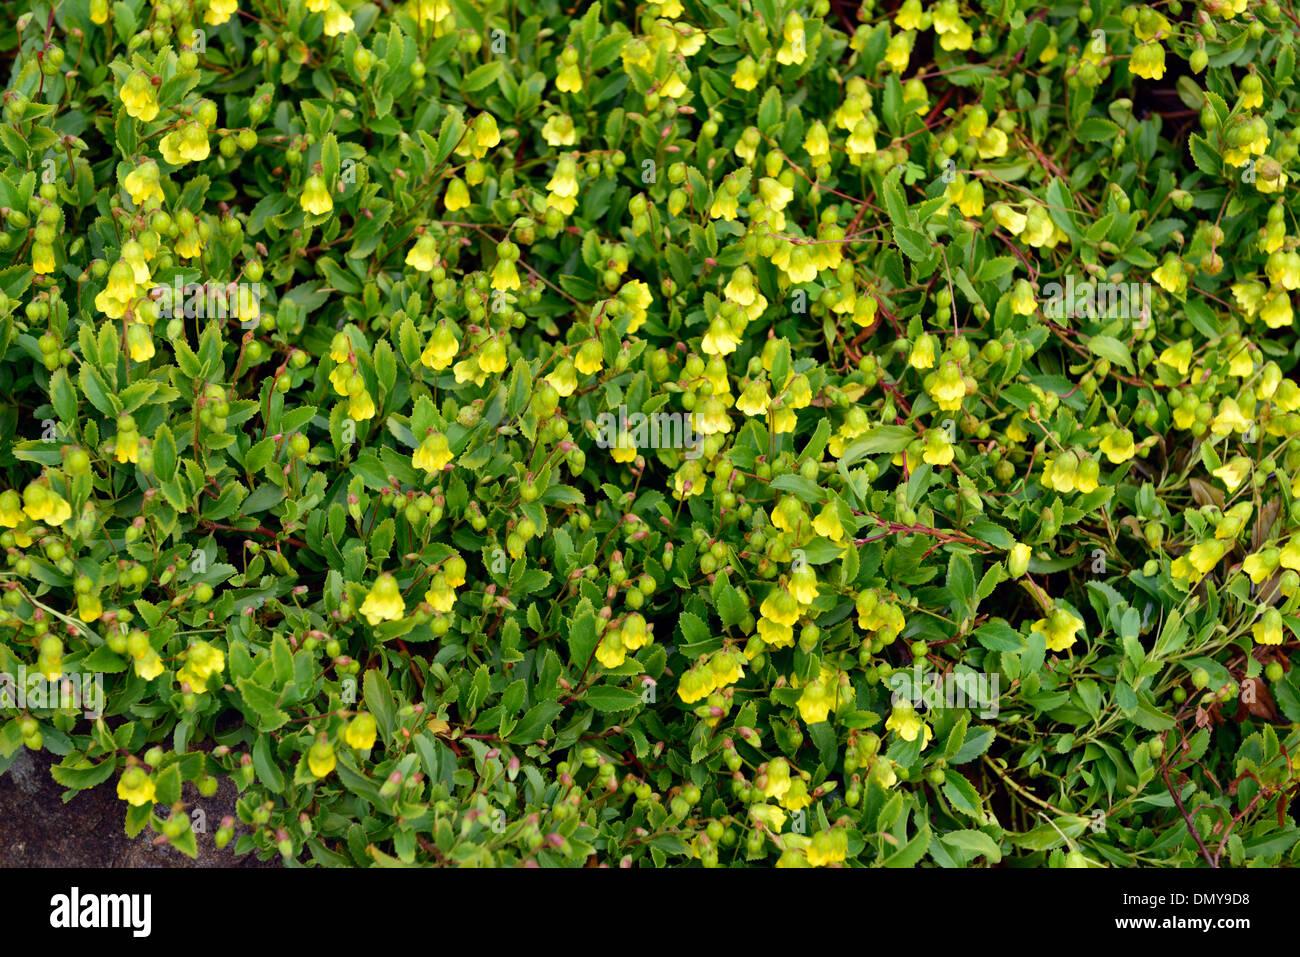 yellow flowering shrub stockfotos yellow flowering shrub bilder alamy. Black Bedroom Furniture Sets. Home Design Ideas